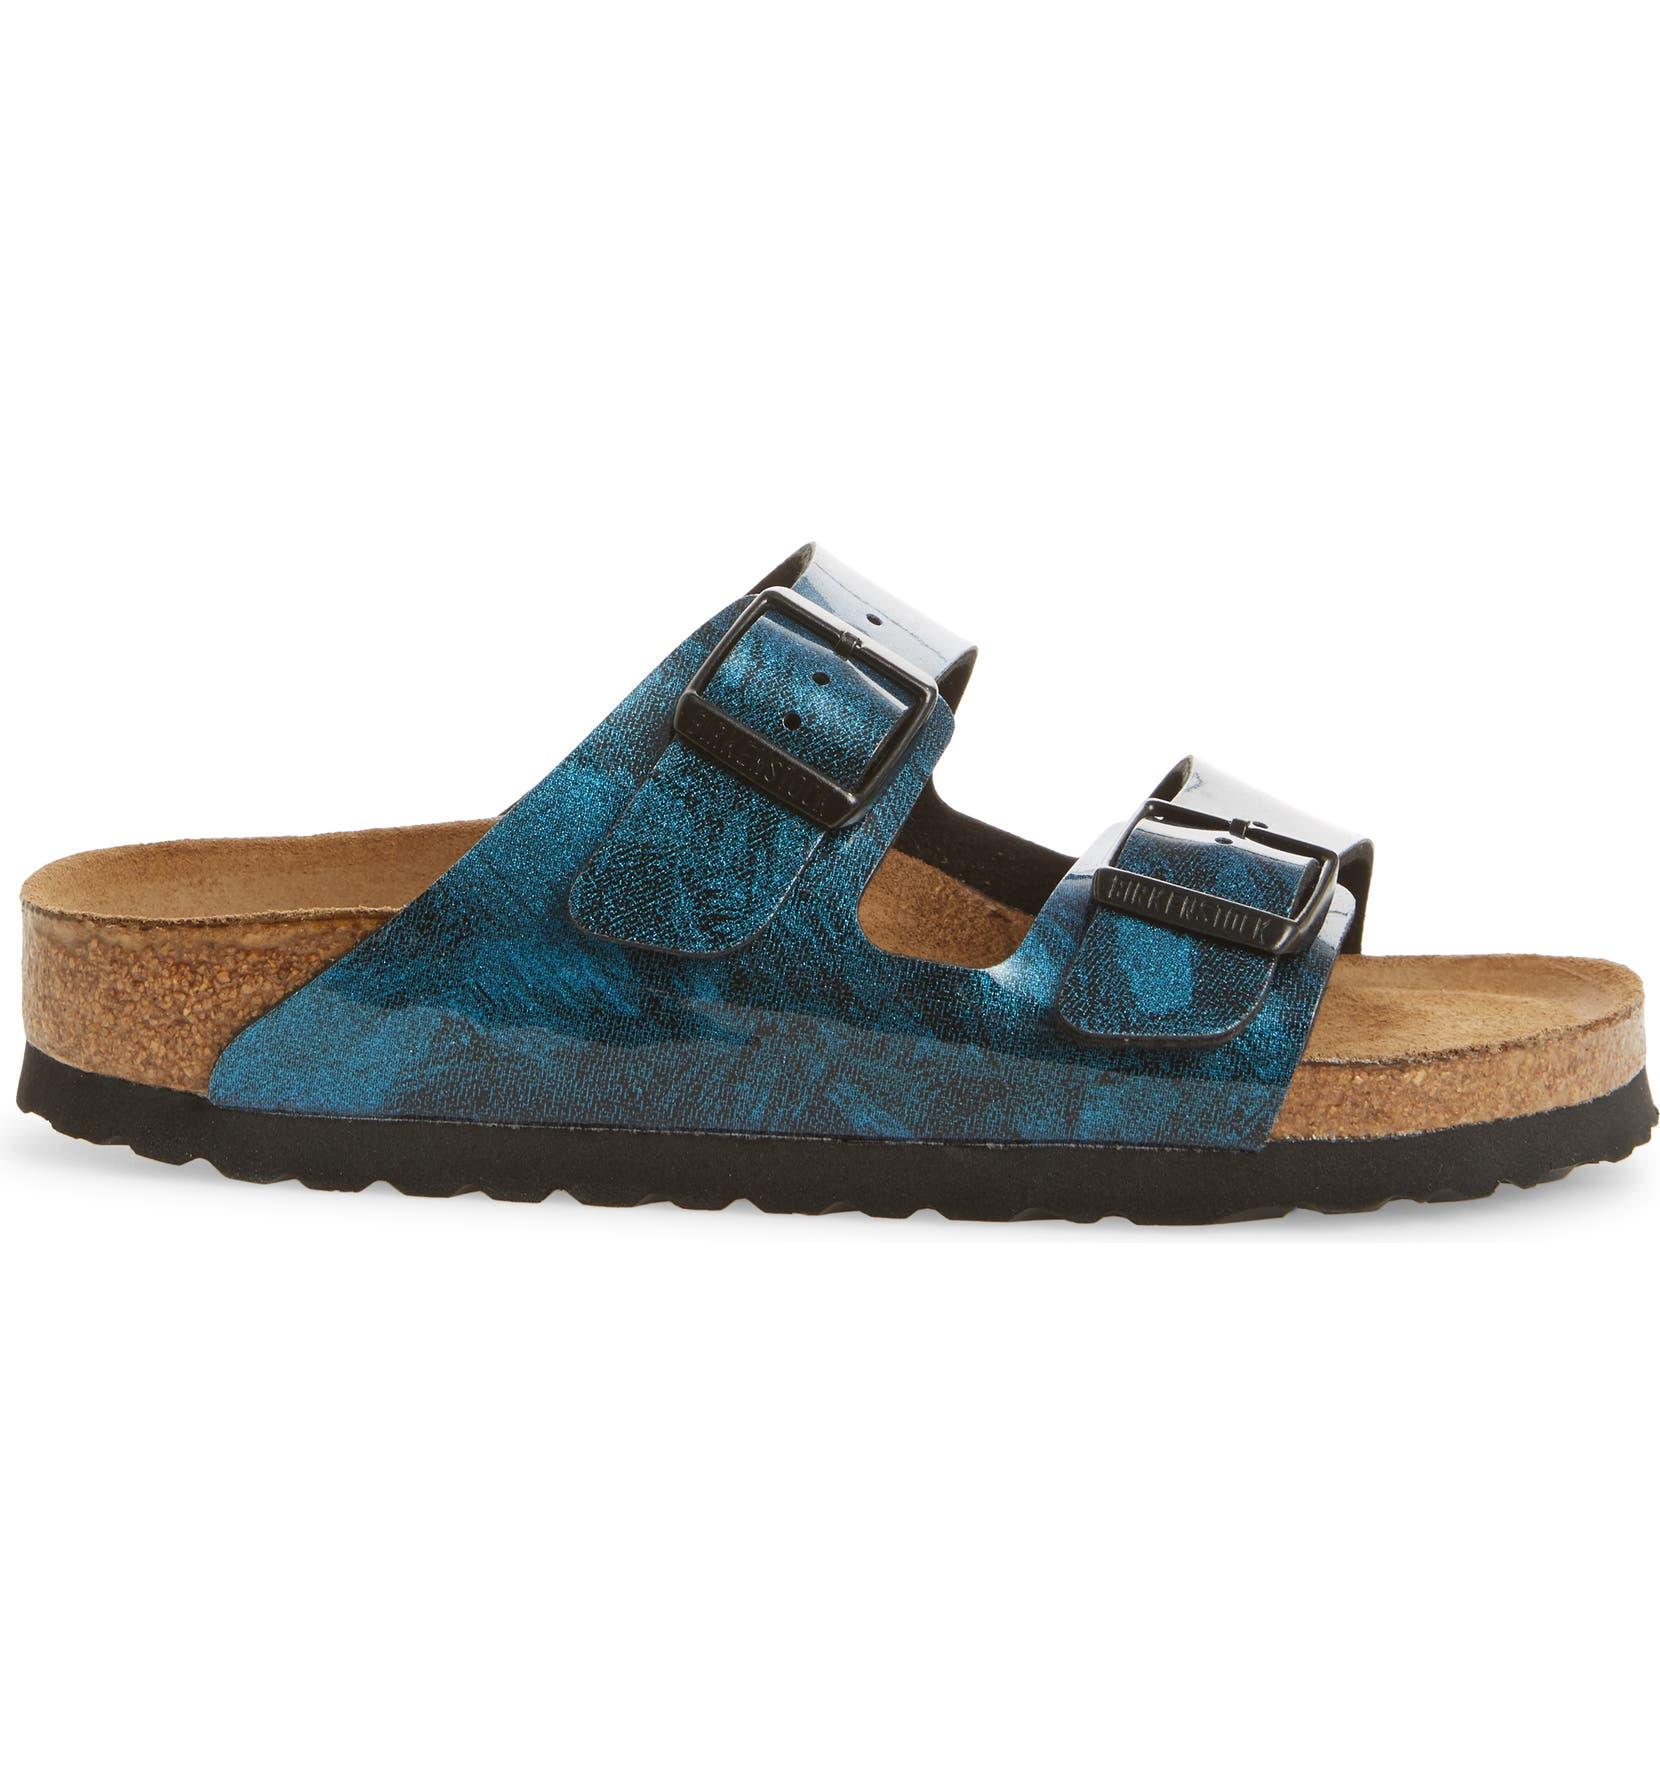 c84f159483f1 Birkenstock Arizona Birko-Flor Soft Footbed Sandal (Women)